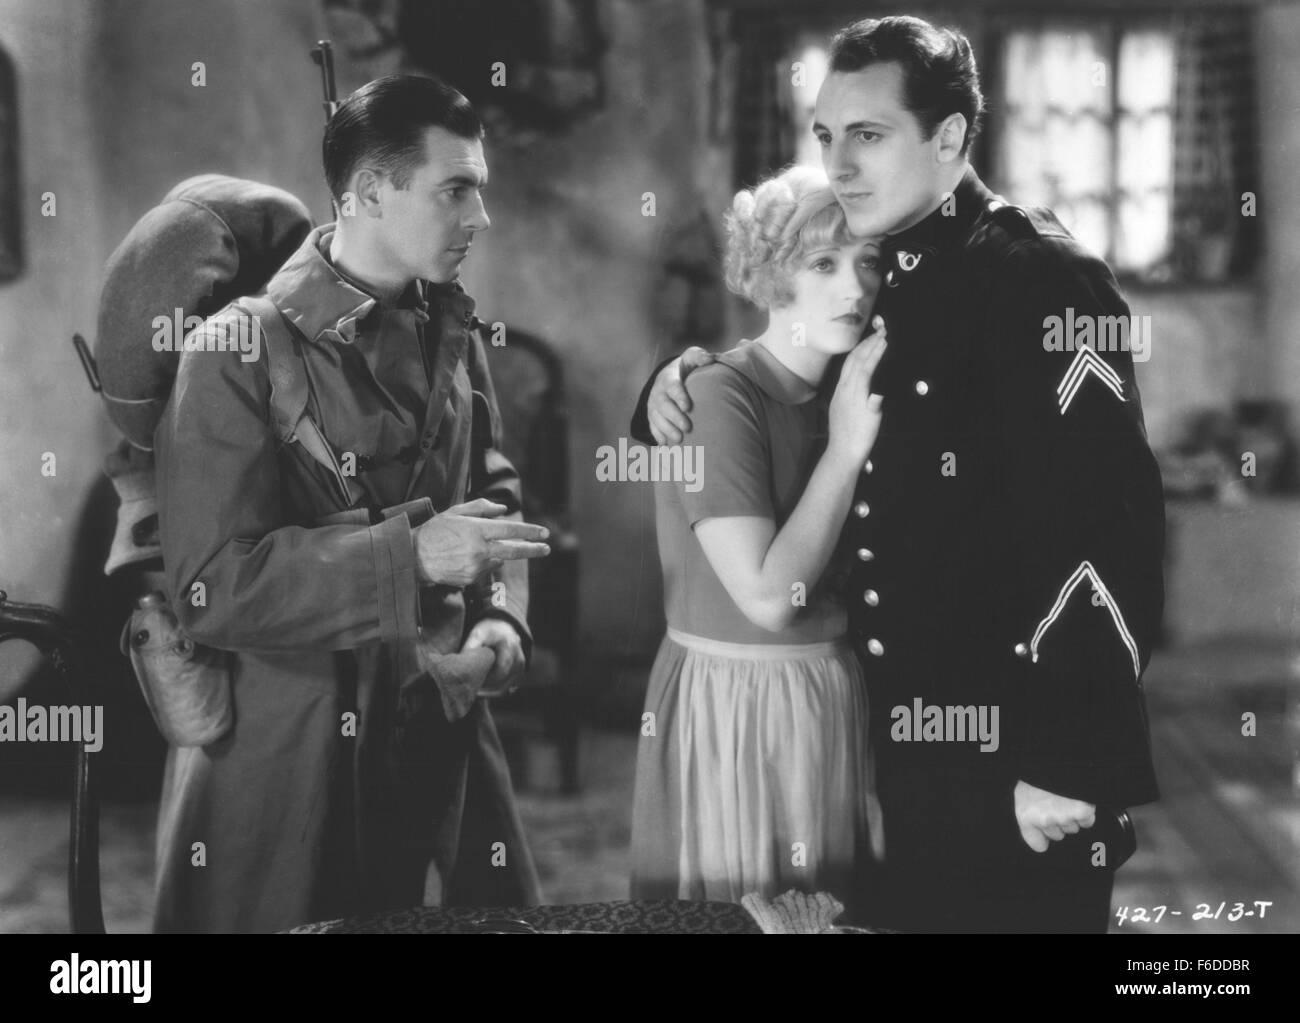 RELEASE DATE: August 24, 1929. MOVIE TITLE: Marianne. STUDIO: Metro-Goldwyn-Mayer (MGM). PLOT: During World War - Stock Image